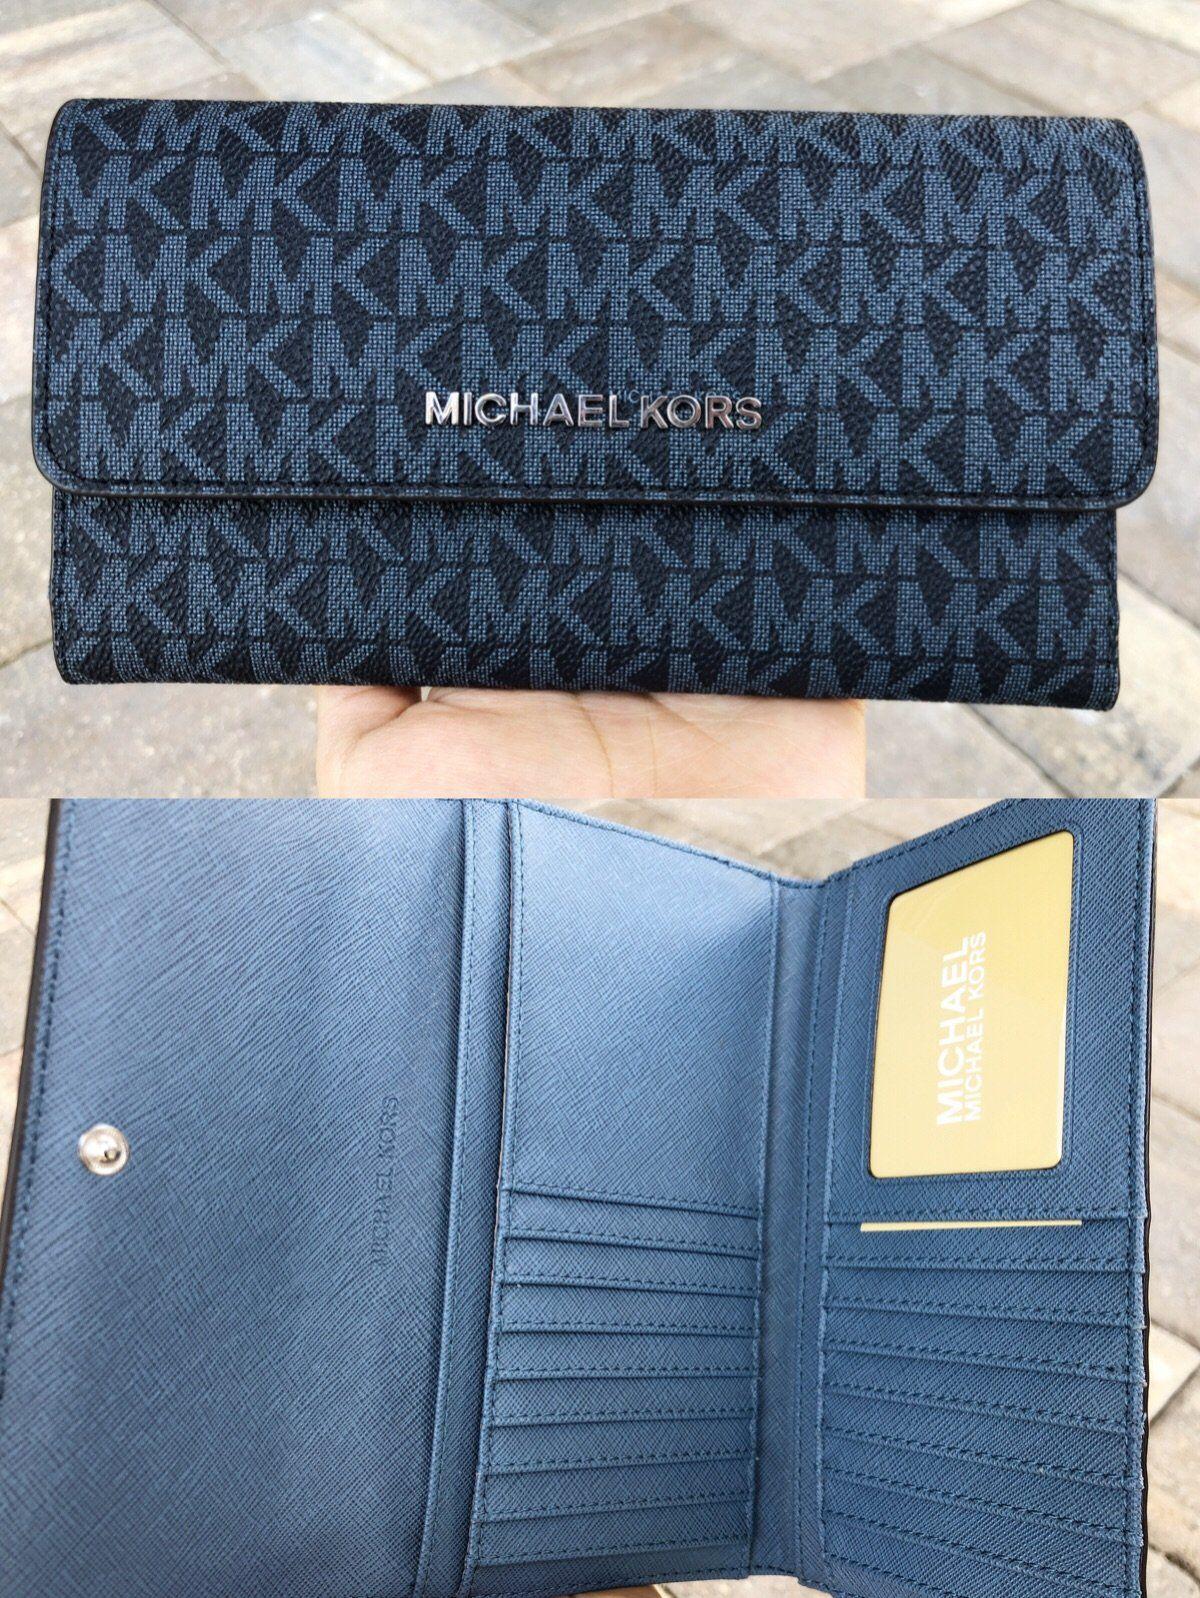 952ff0c7d168 Michael Kors Jet Set Travel Large Trifold Wallet Admiral Blue Signature MK   Handbags  GabysBags